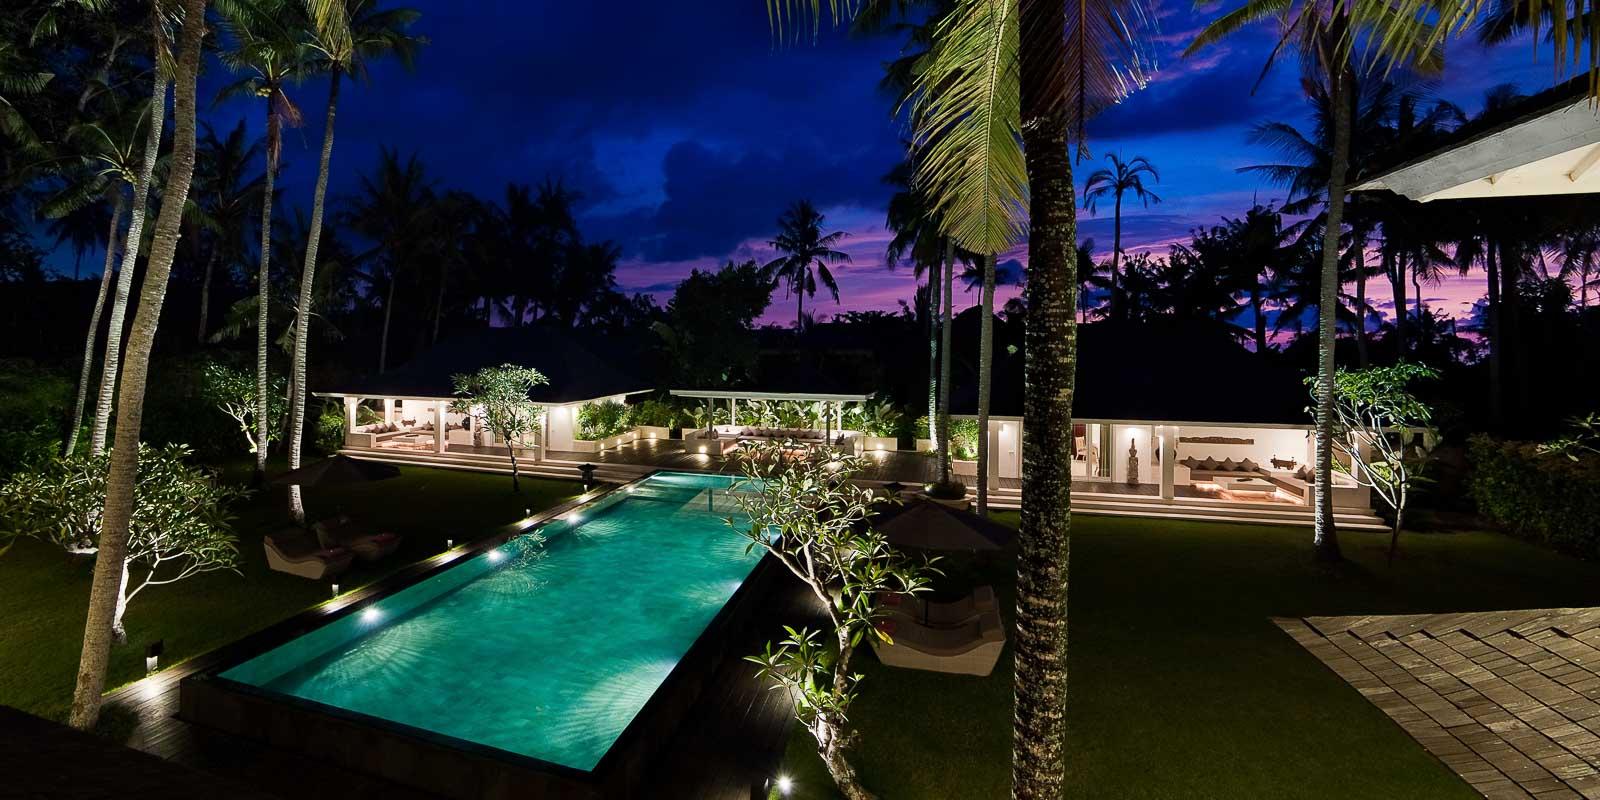 villa-matahari-swimming-pool-chillout-garden-suites